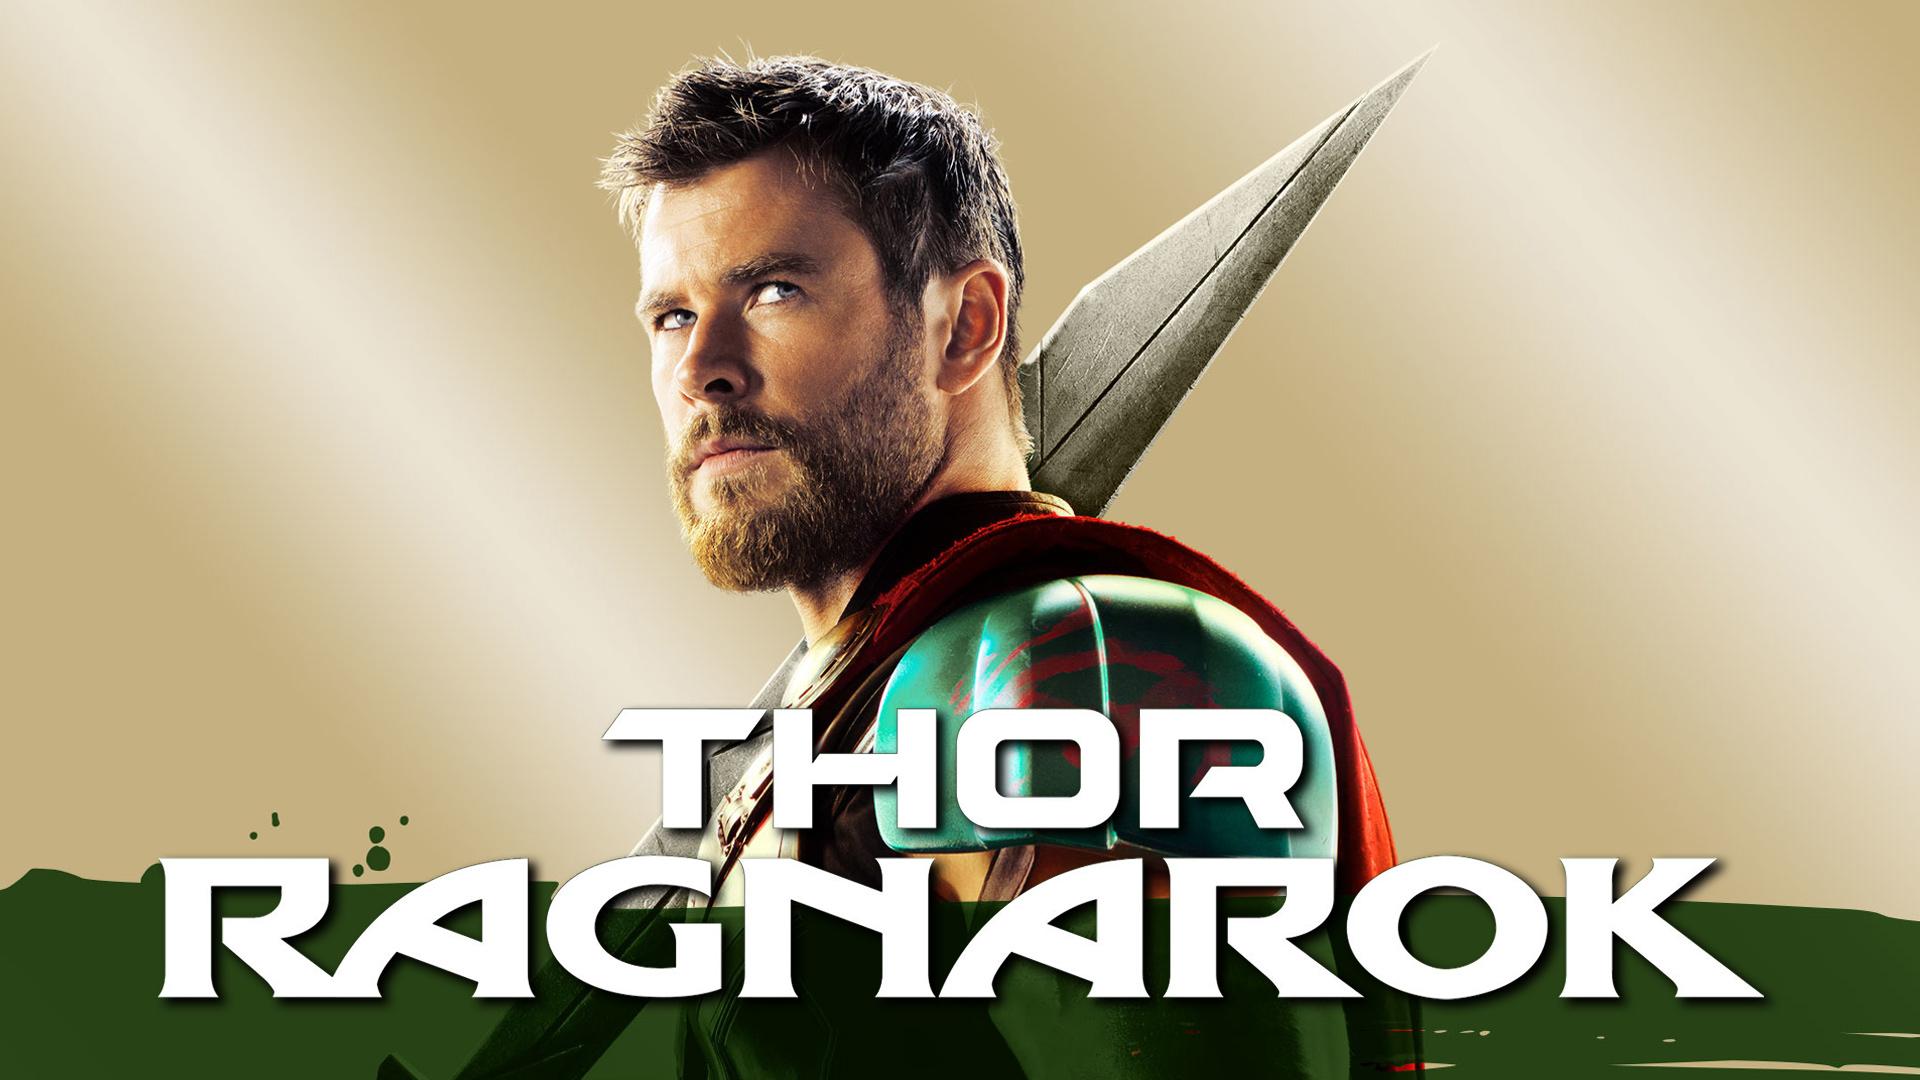 Thor-Ragnarok (4K UHD)